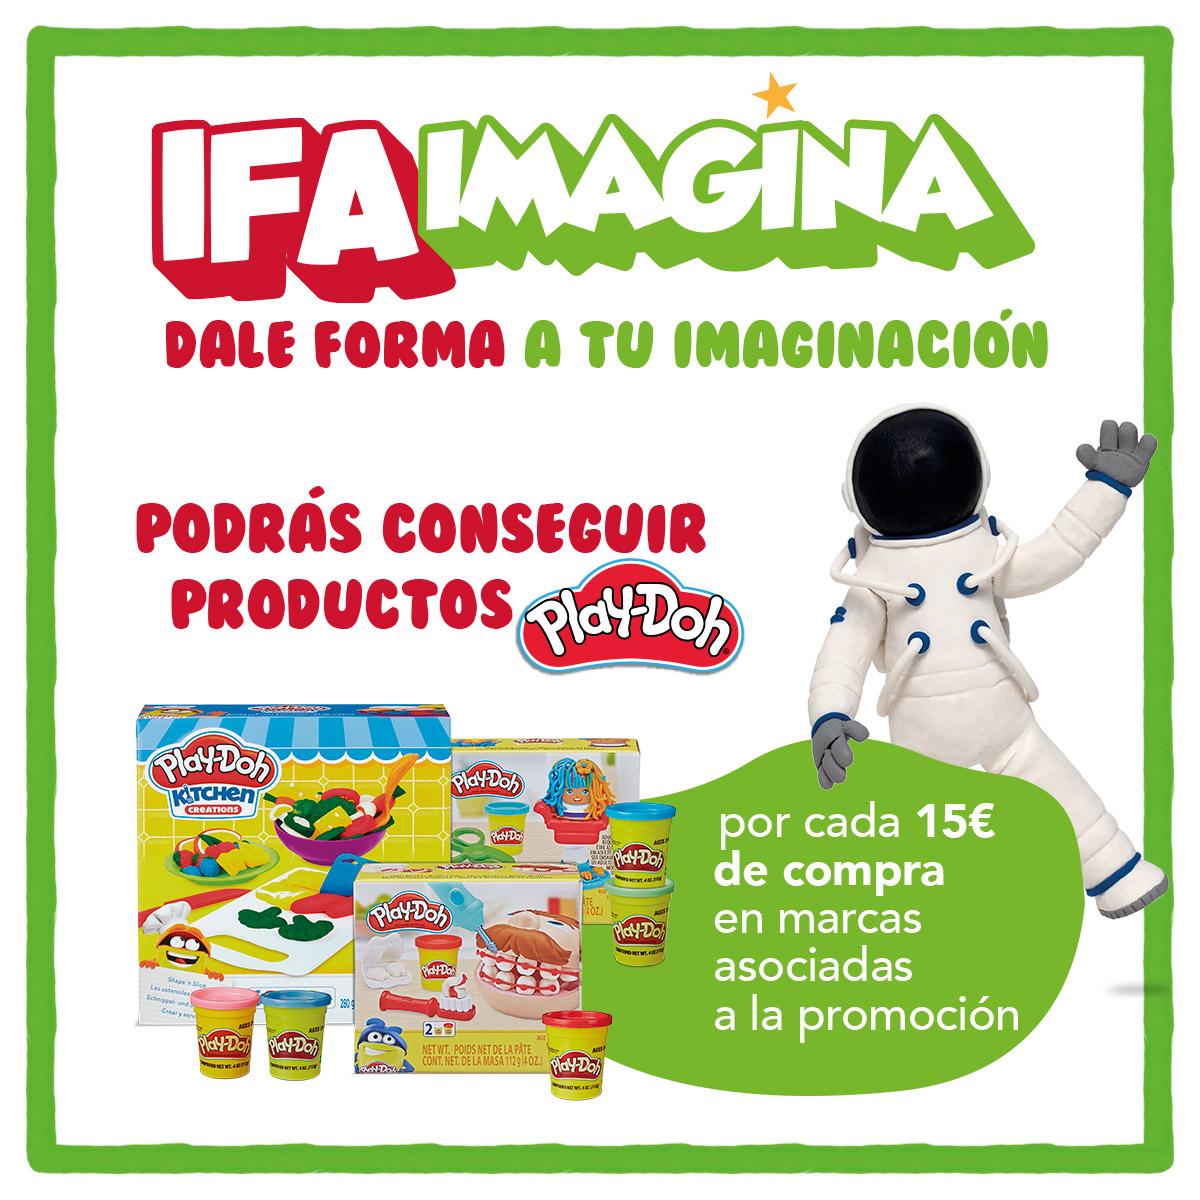 IFA IMAGINA